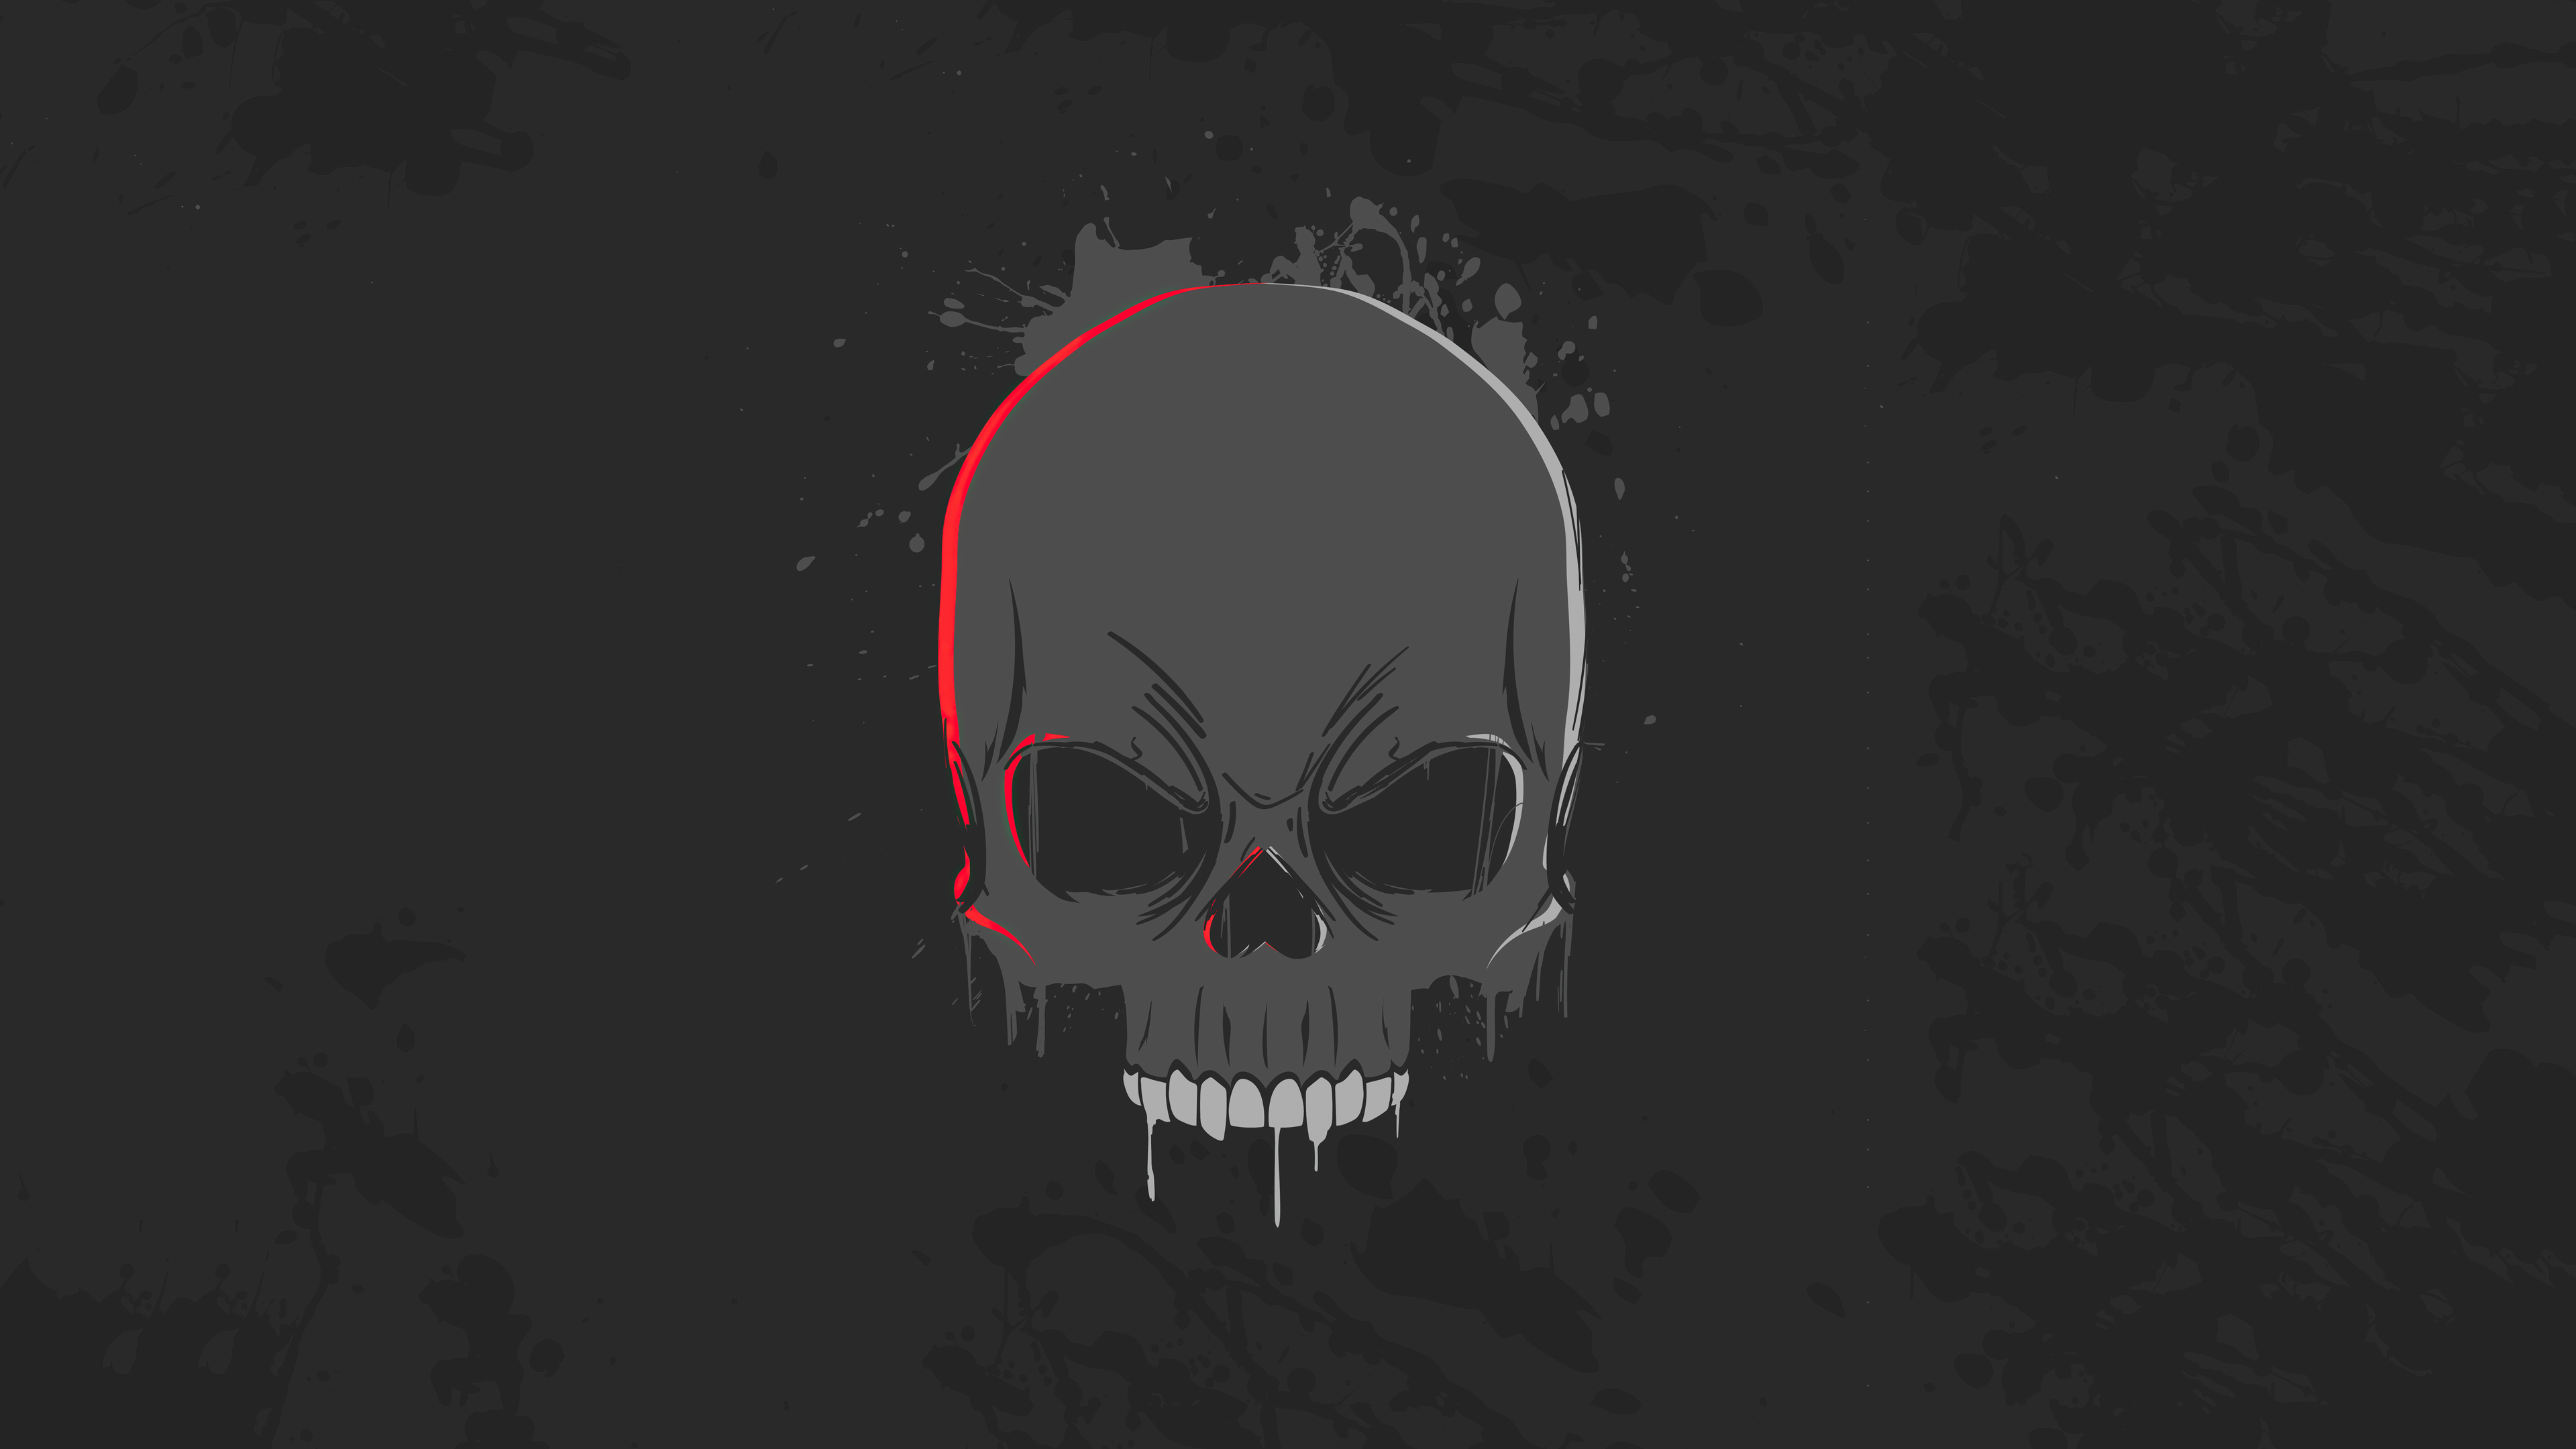 General 3840x2160 skull dark minimalism 4K artwork digital art black